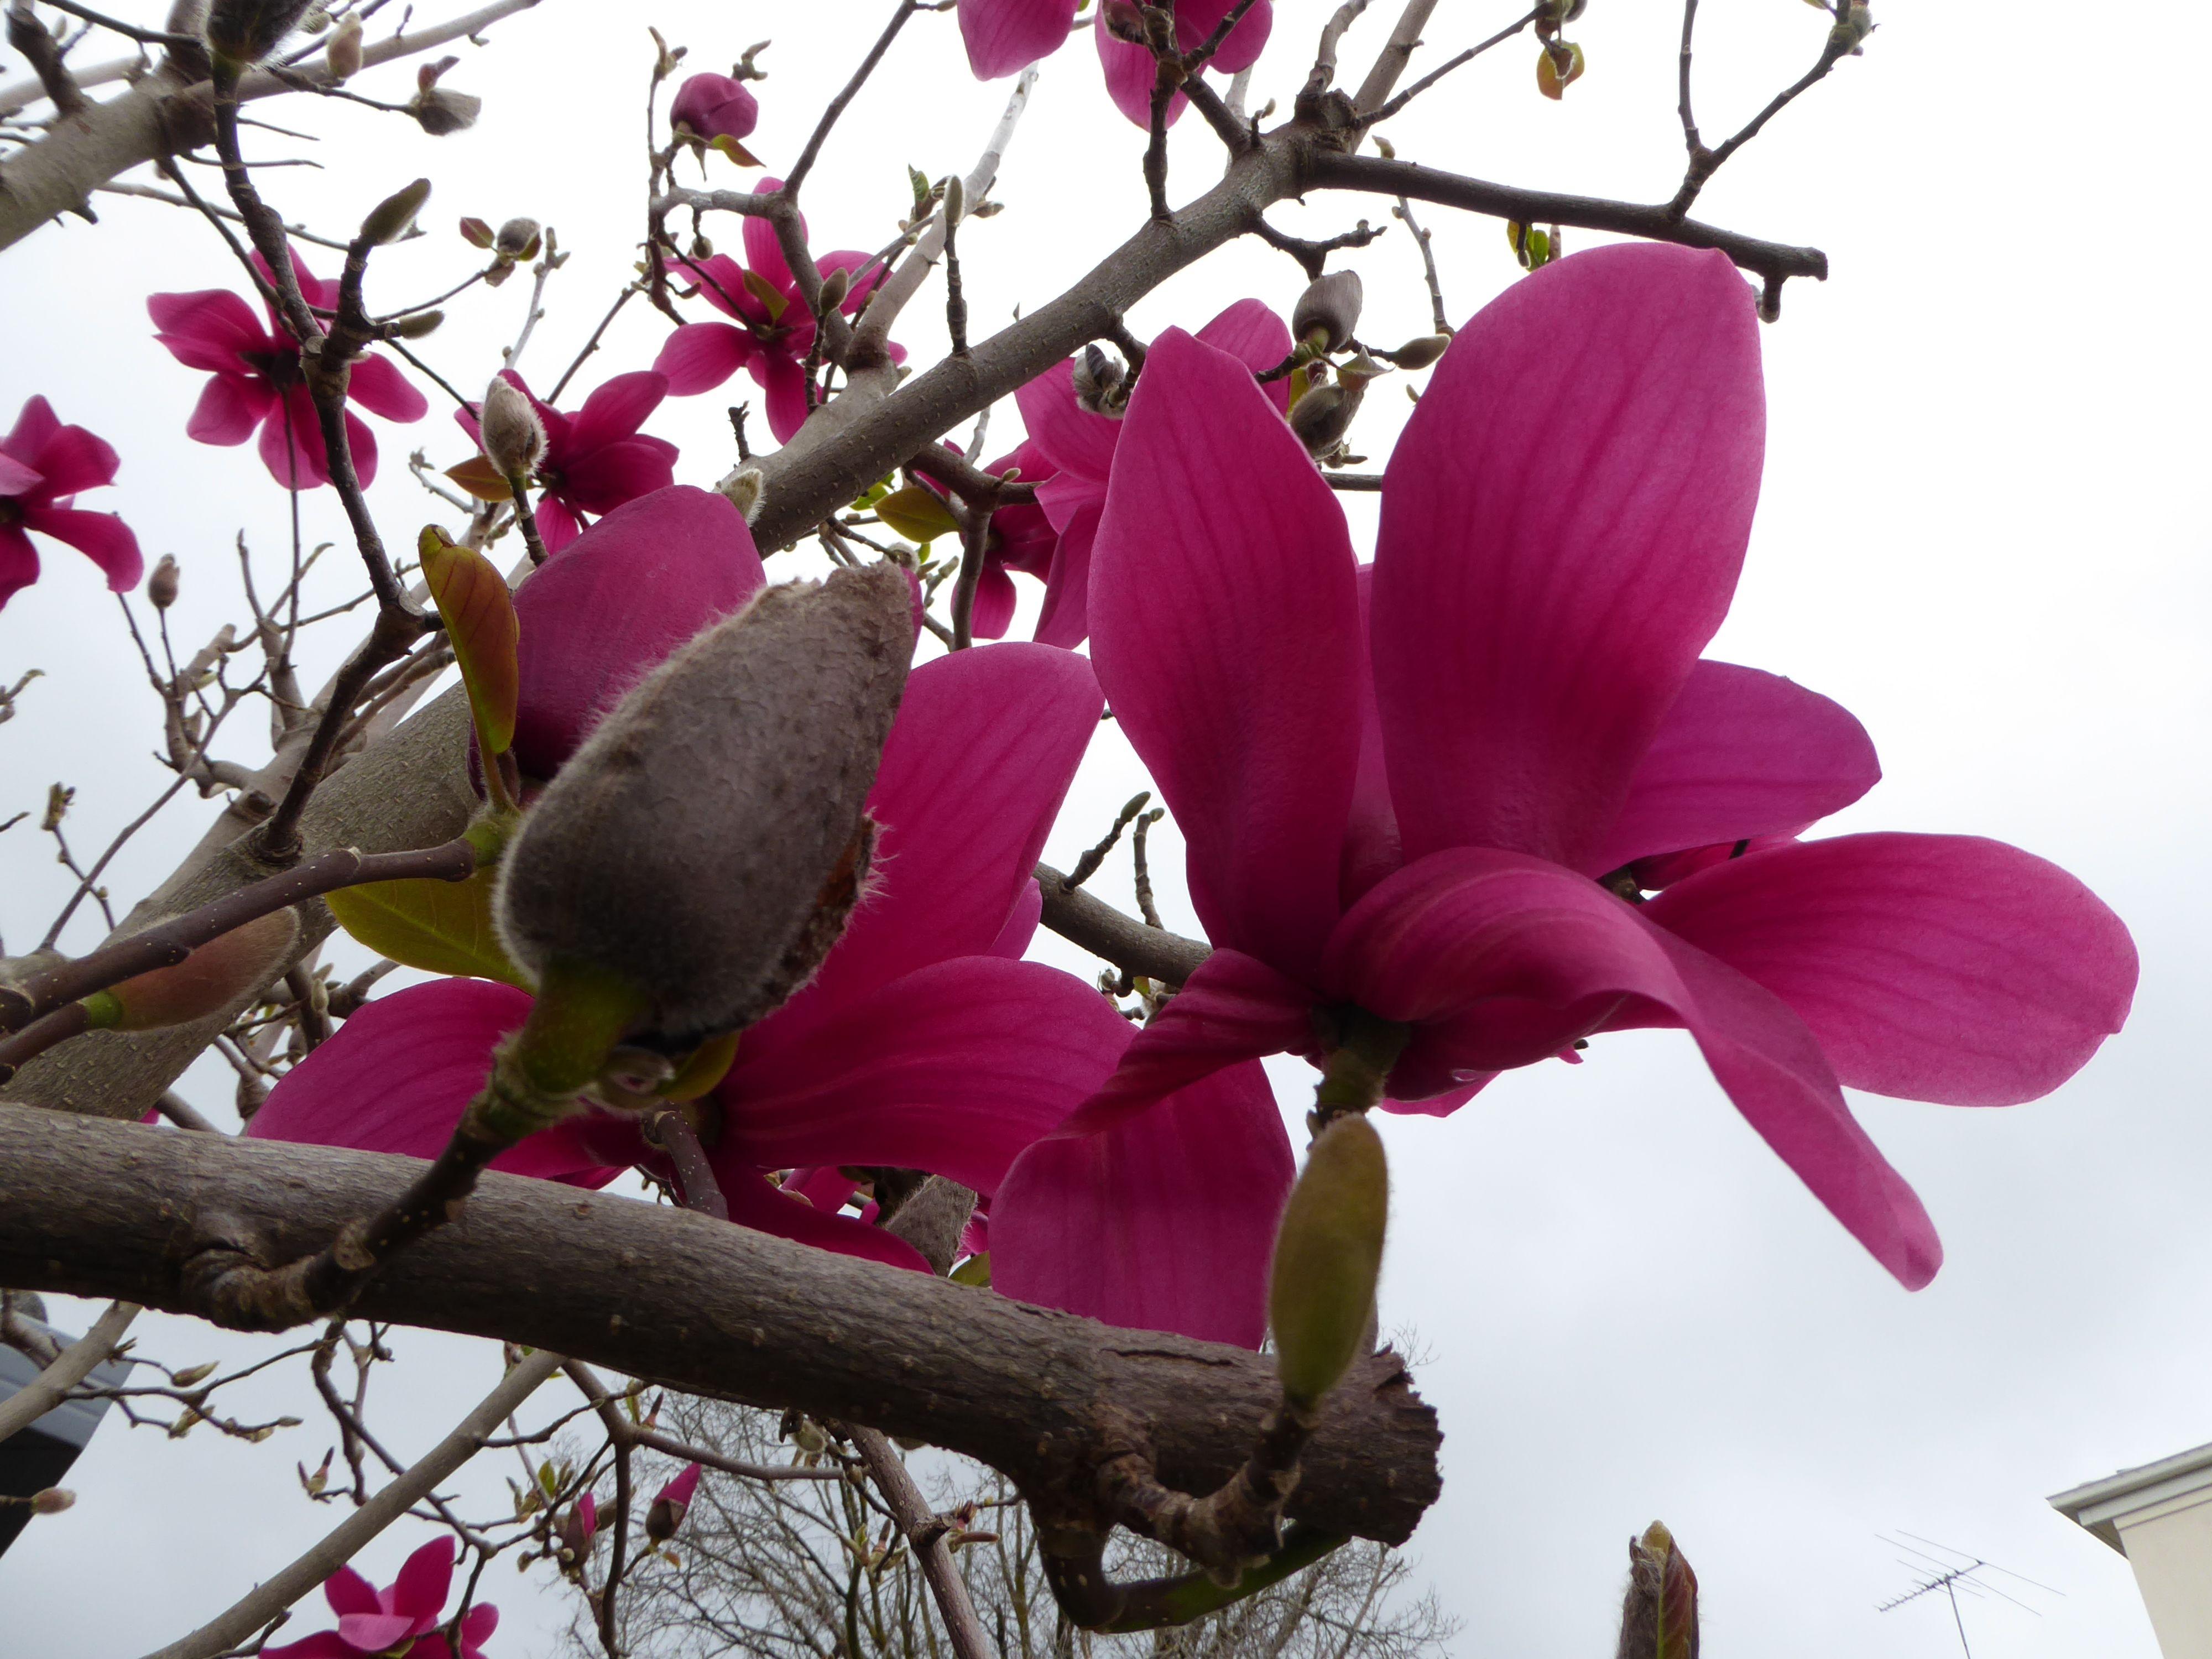 Vulcan Magnolia Tree Gardening Pinterest Magnolia Trees And